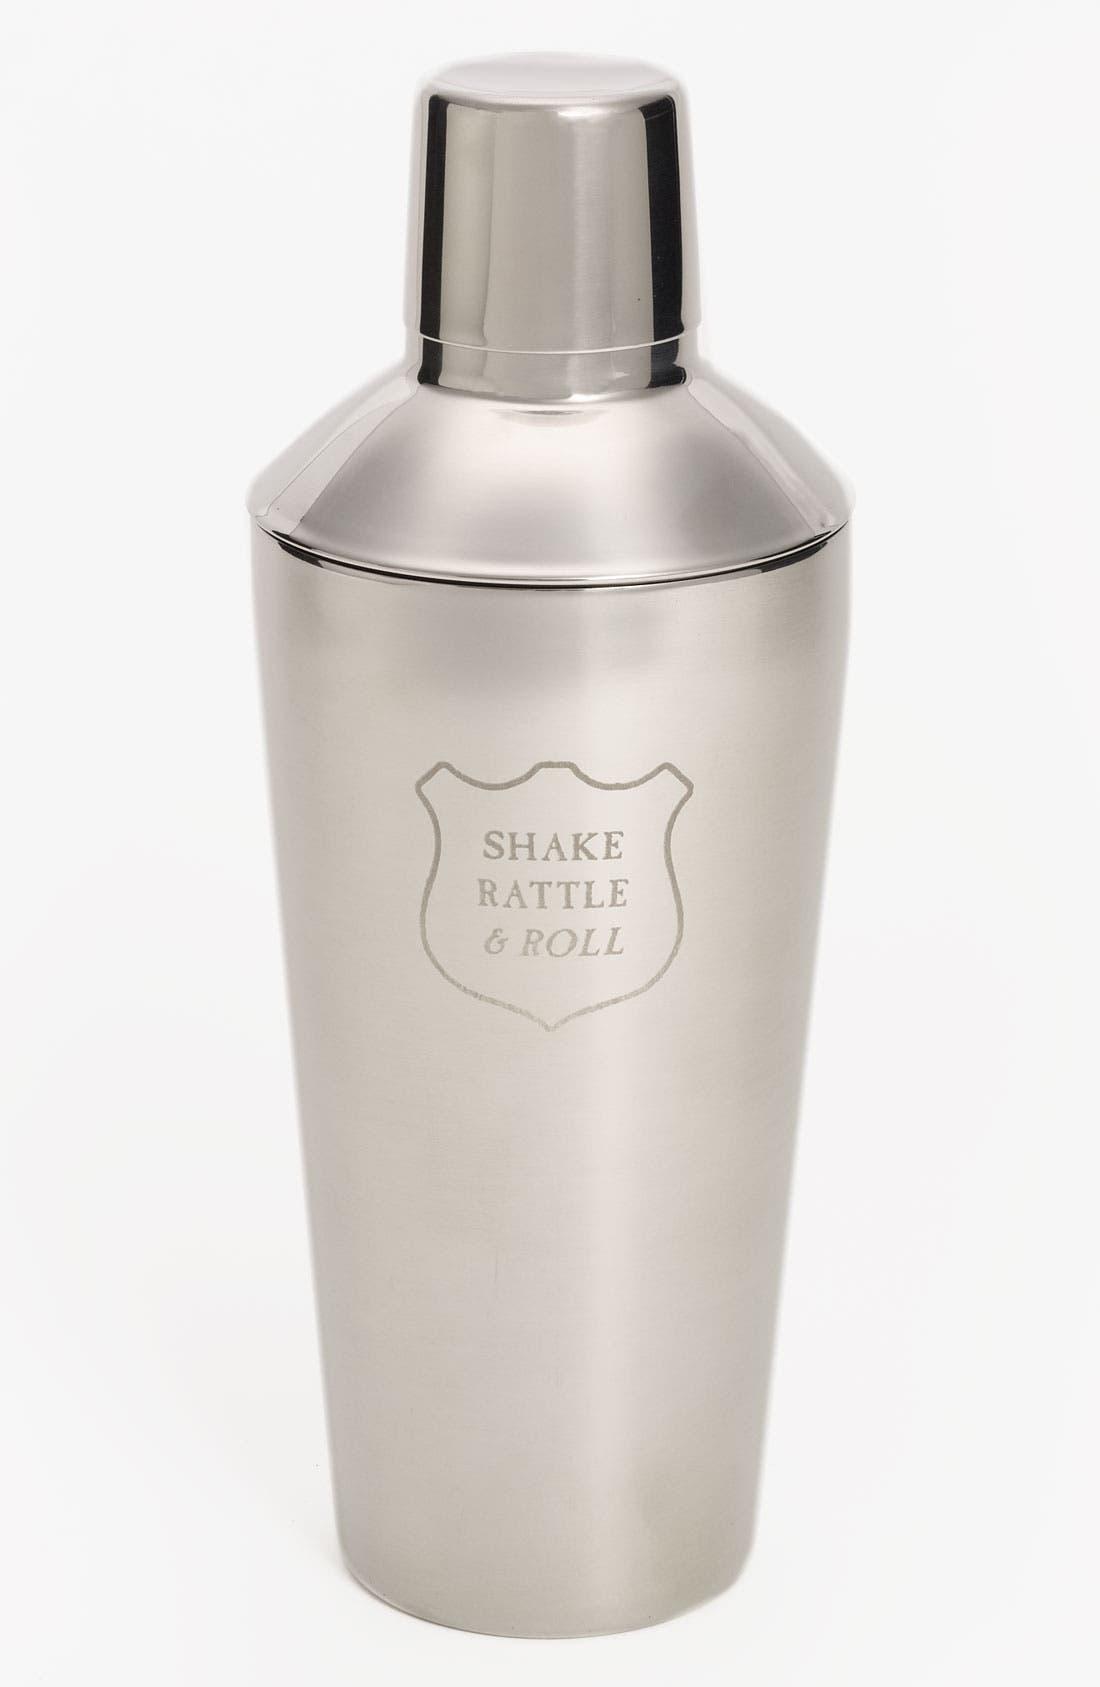 Main Image - 'Shake, Rattle & Roll' Cocktail Shaker